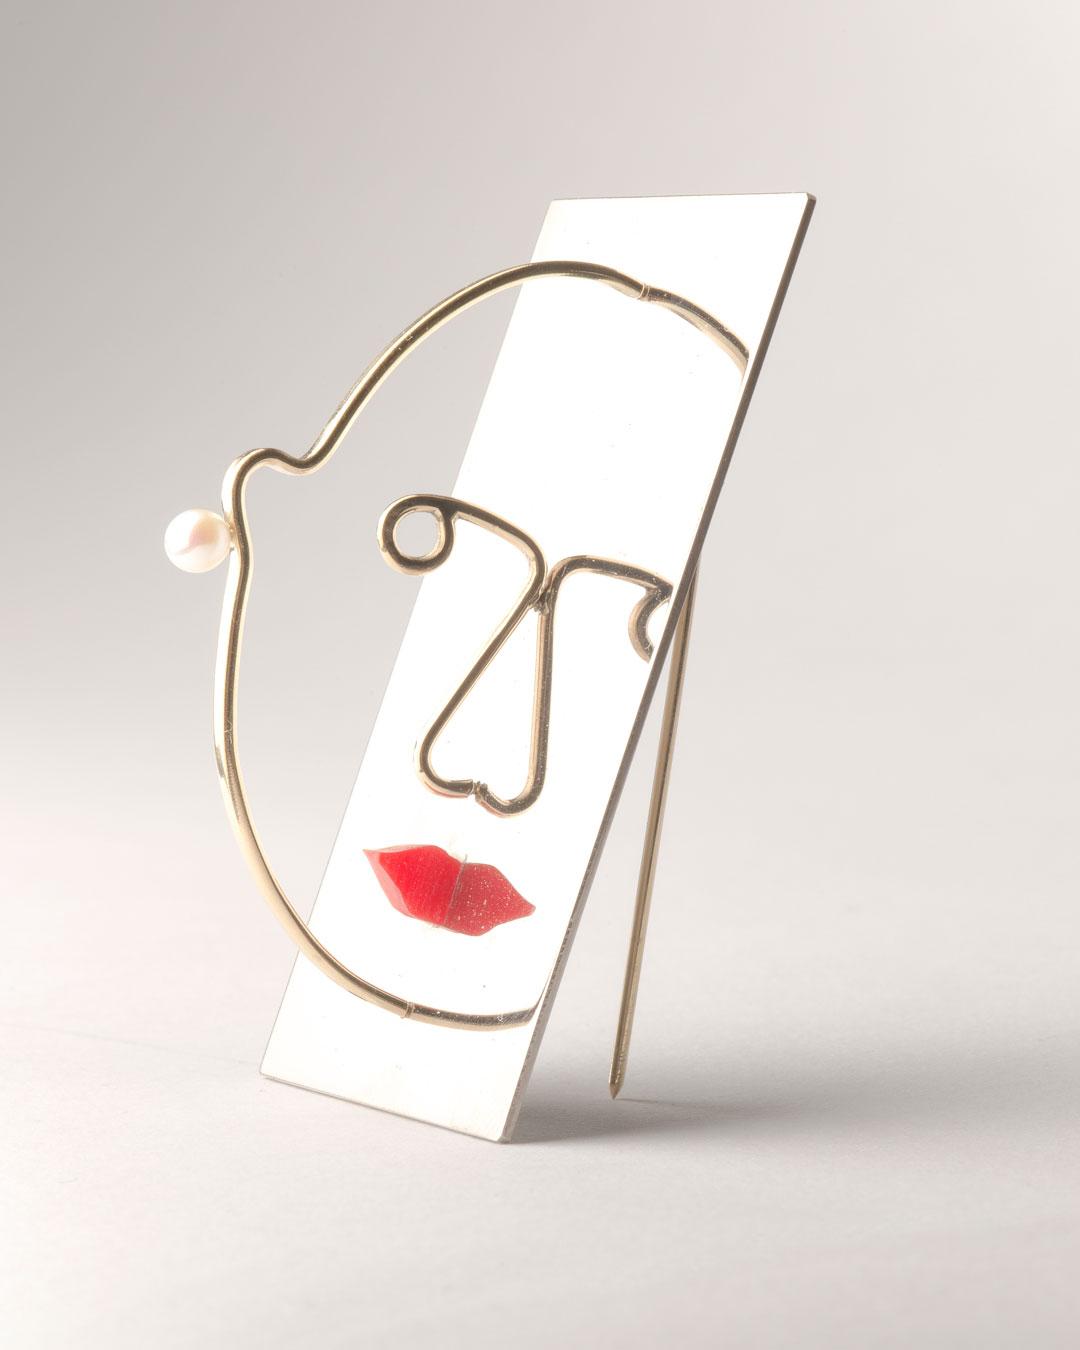 Herman Hermsen, Vanity, 2019, brooch; white gold, yellow gold, pearl, plastic, 60 x 40 x 30 mm, €4850